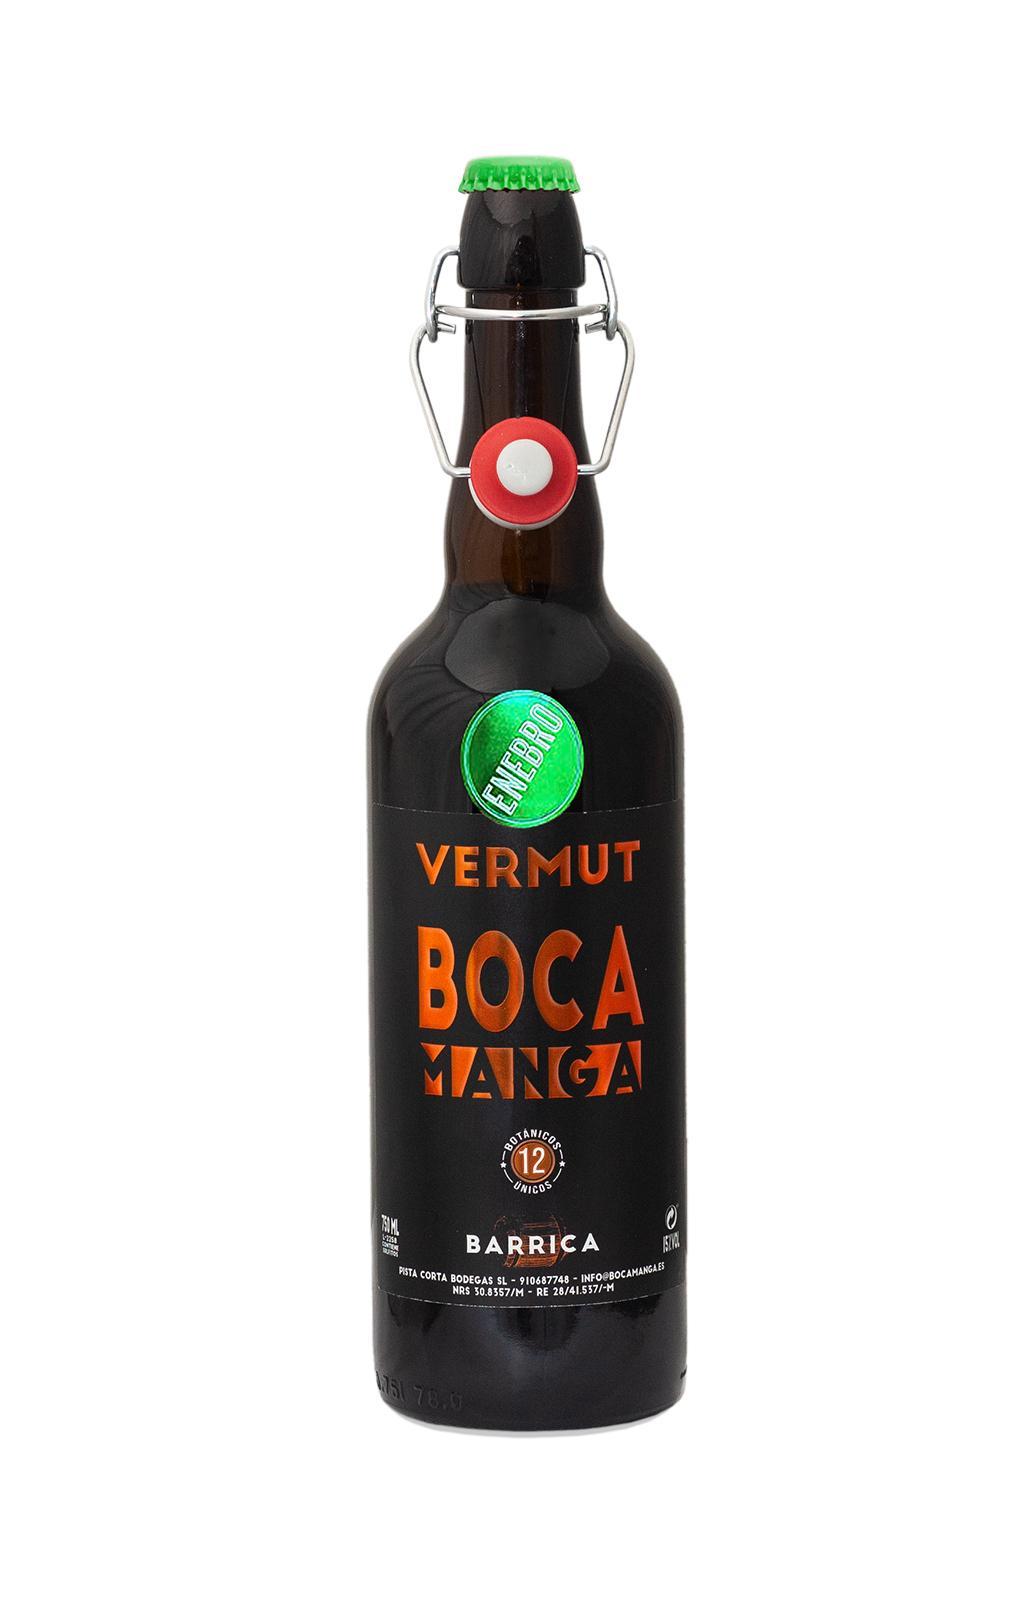 Vermut Bocamanga al Enebro